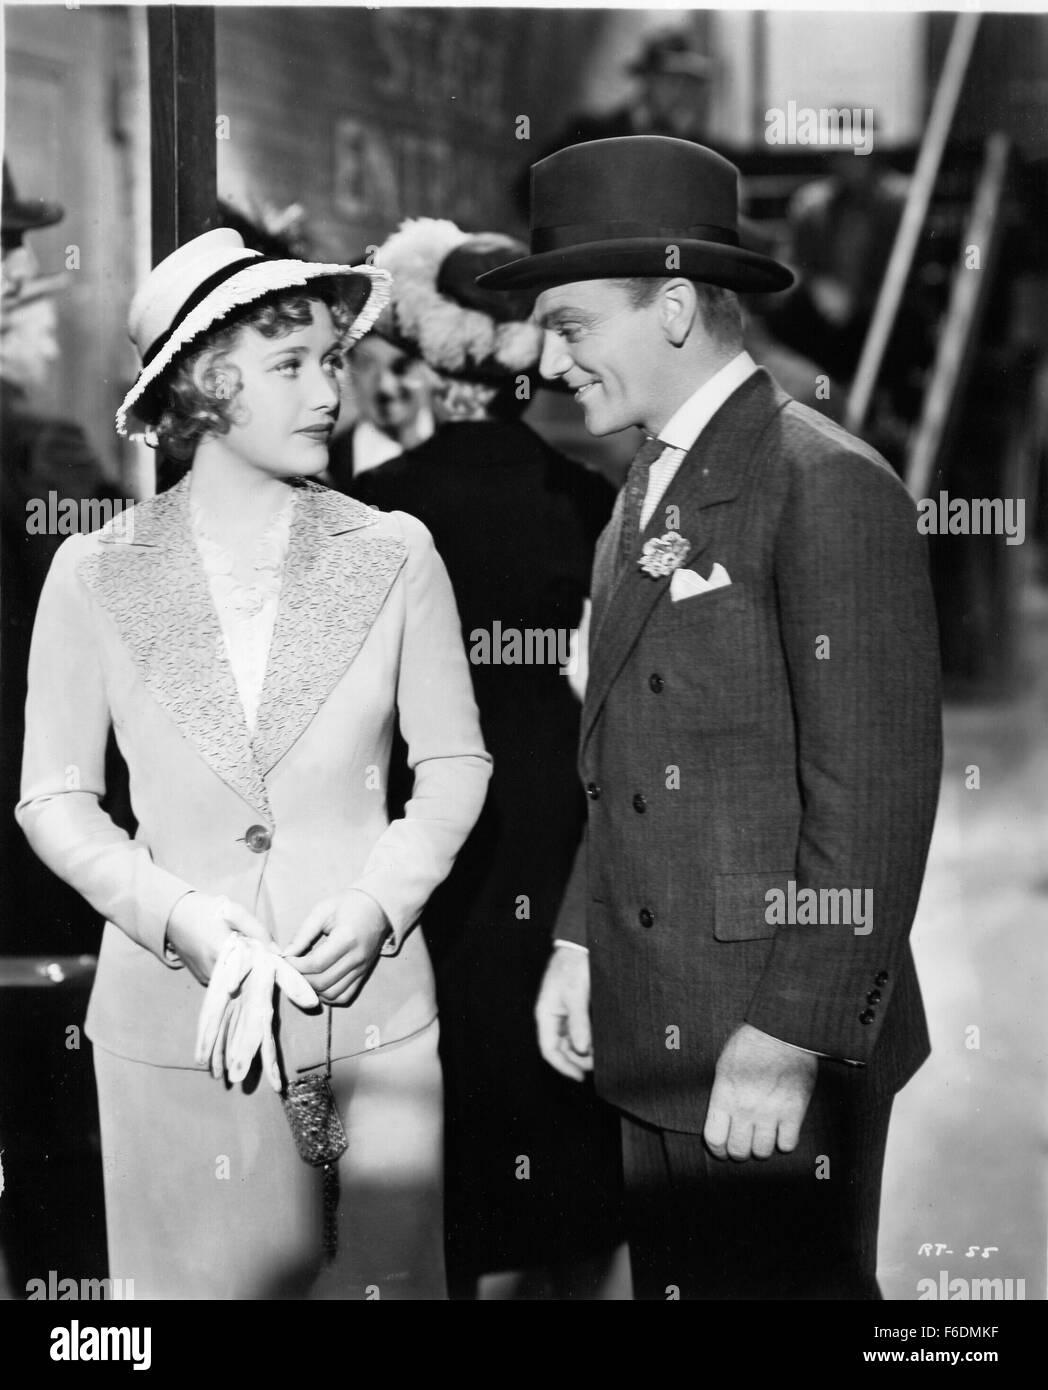 RELEASE DATE: October 23, 1939. MOVIE TITLE: The Roaring Twenties. STUDIO: Warner Bros. Pictures. PLOT: After the Stock Photo